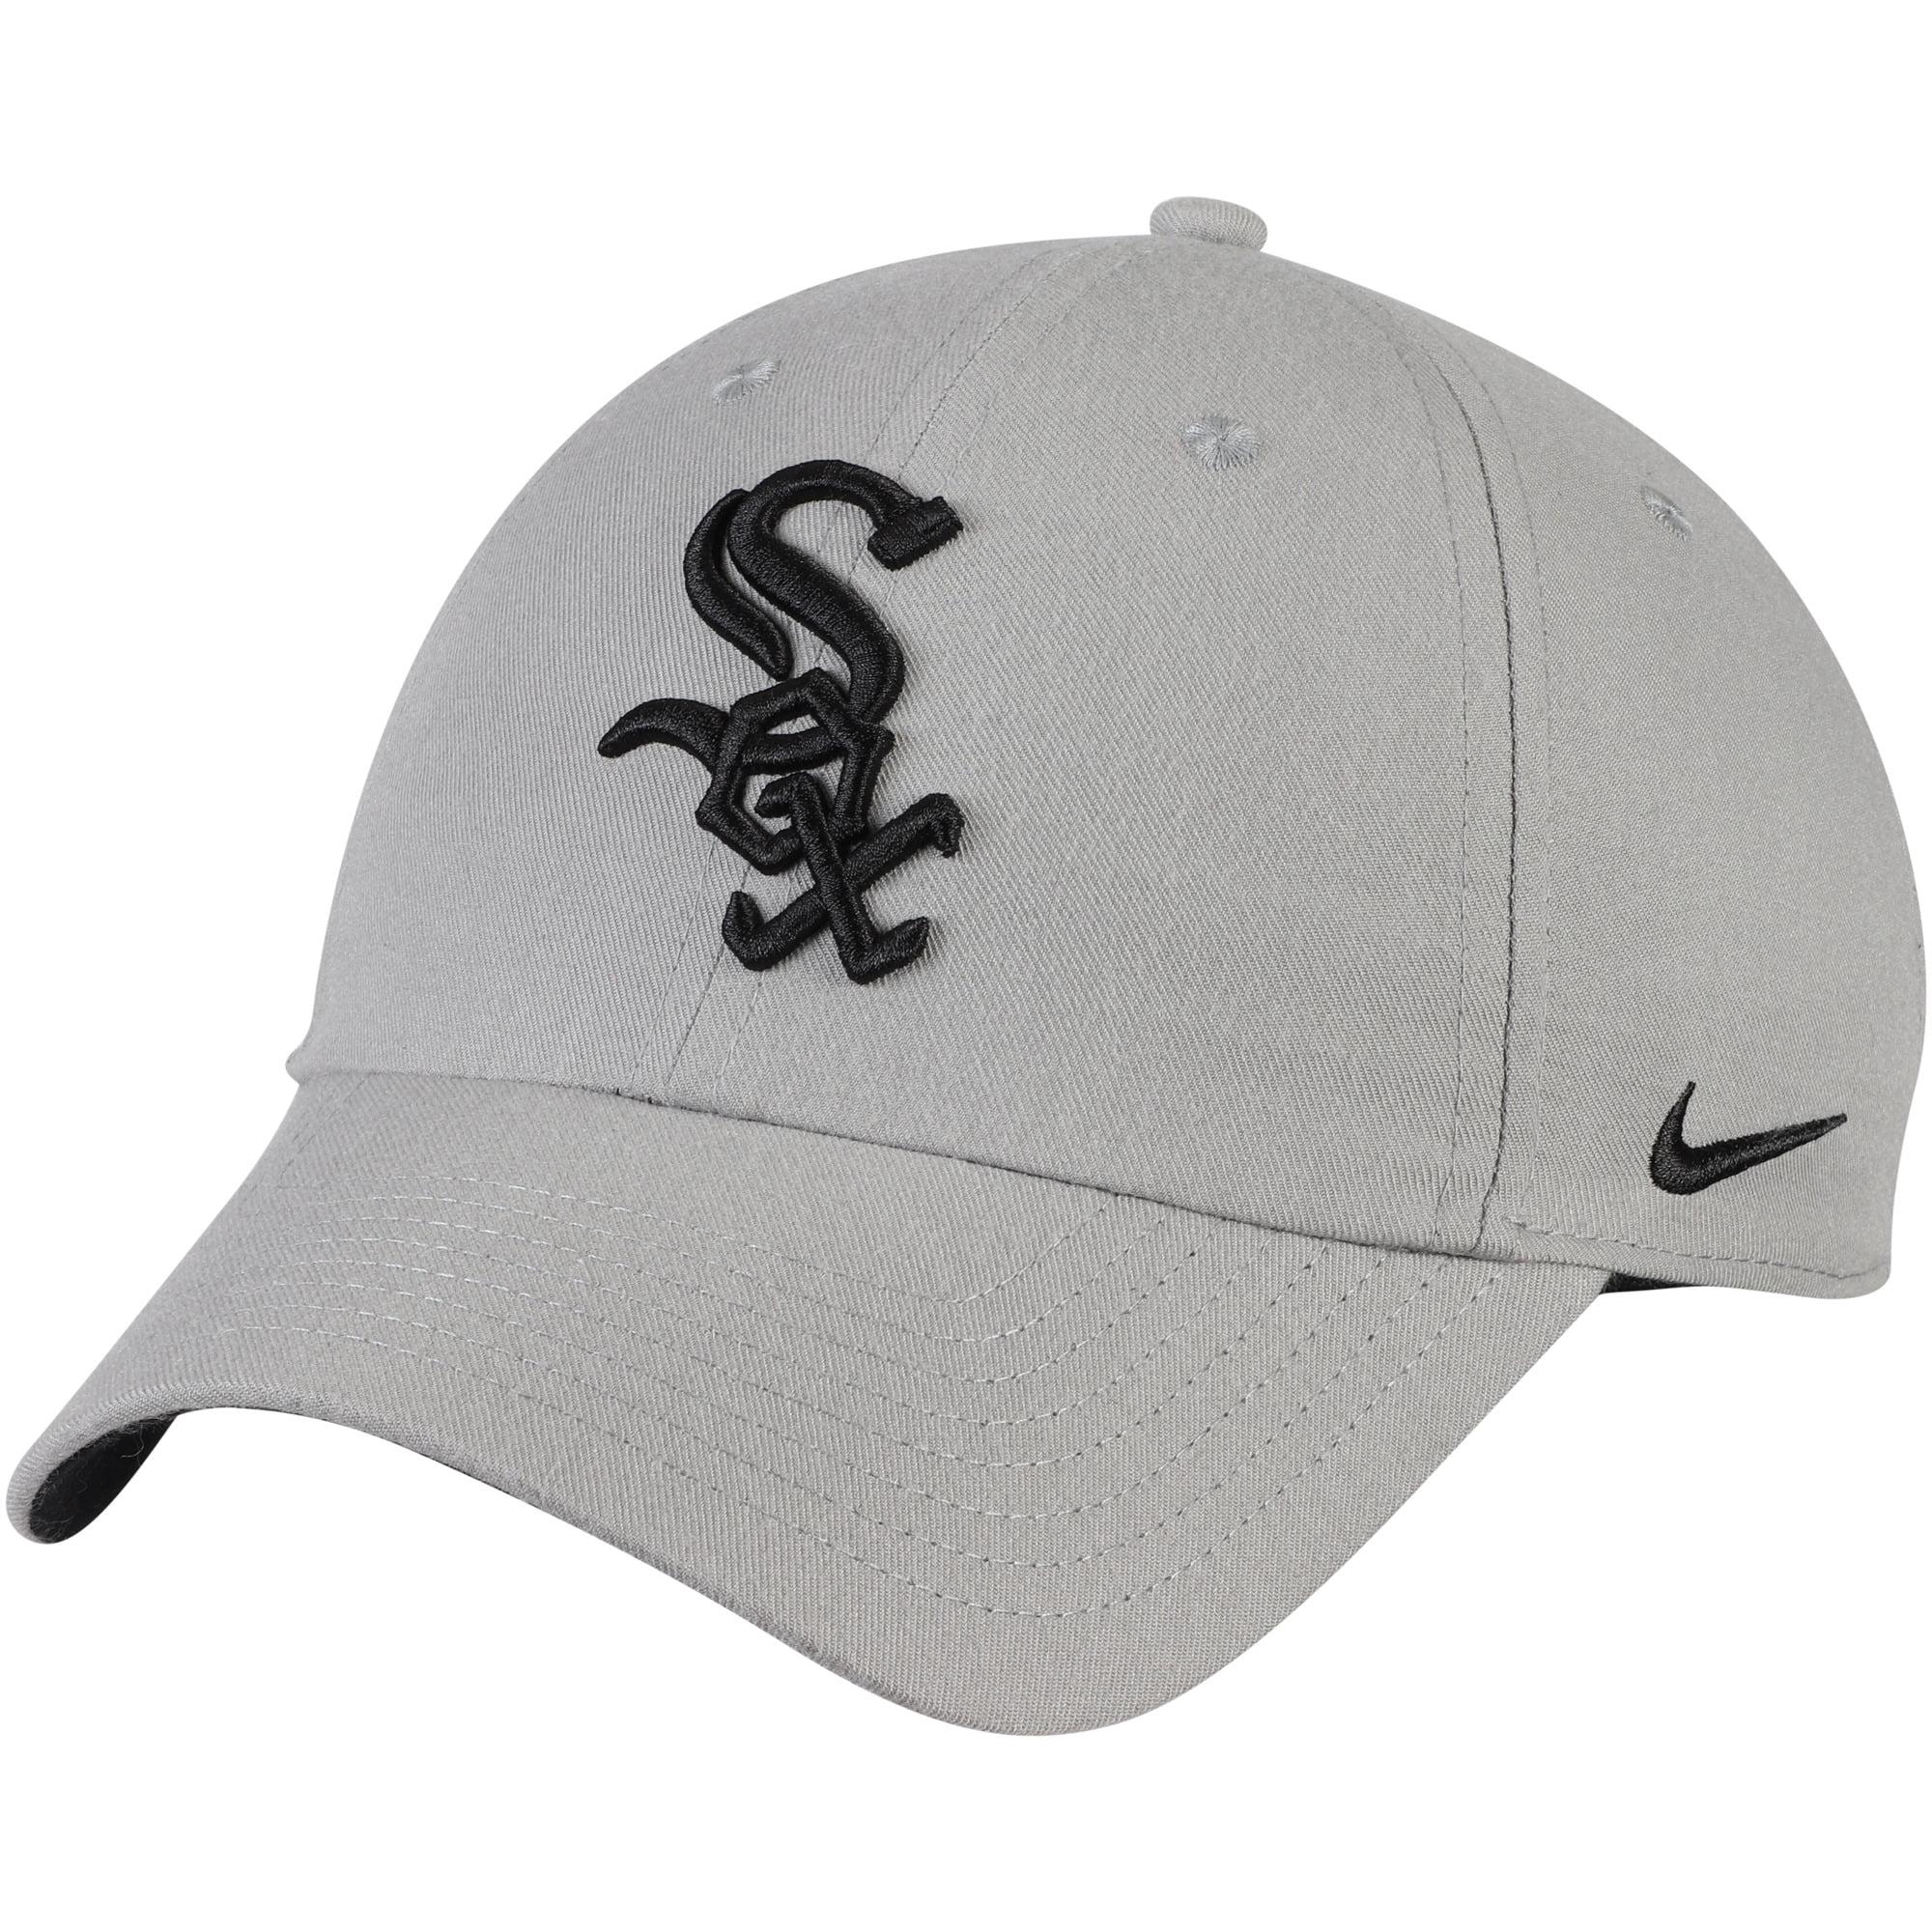 Chicago White Sox Nike Heritage 86 Stadium Performance Adjustable Hat - Gray - OSFA